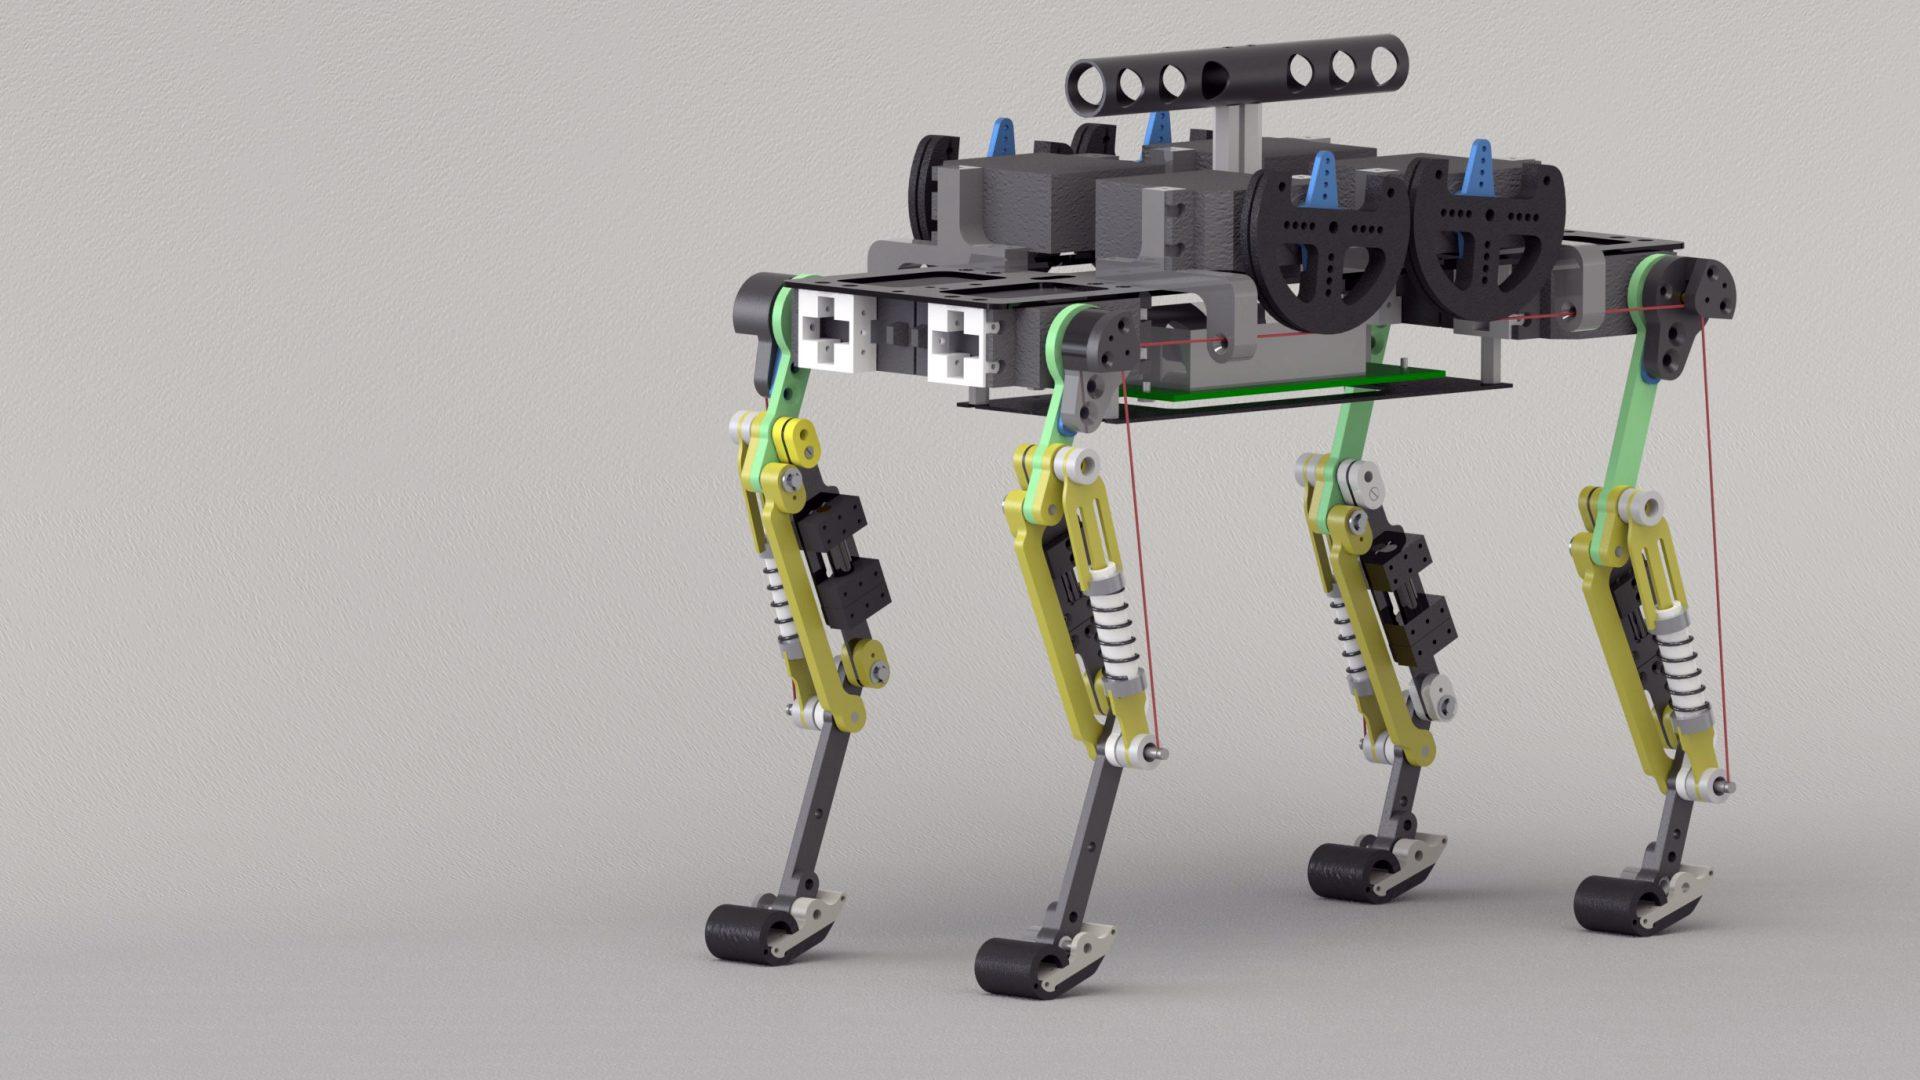 Picture of Cheetah-cub, a compliant quadruped robot